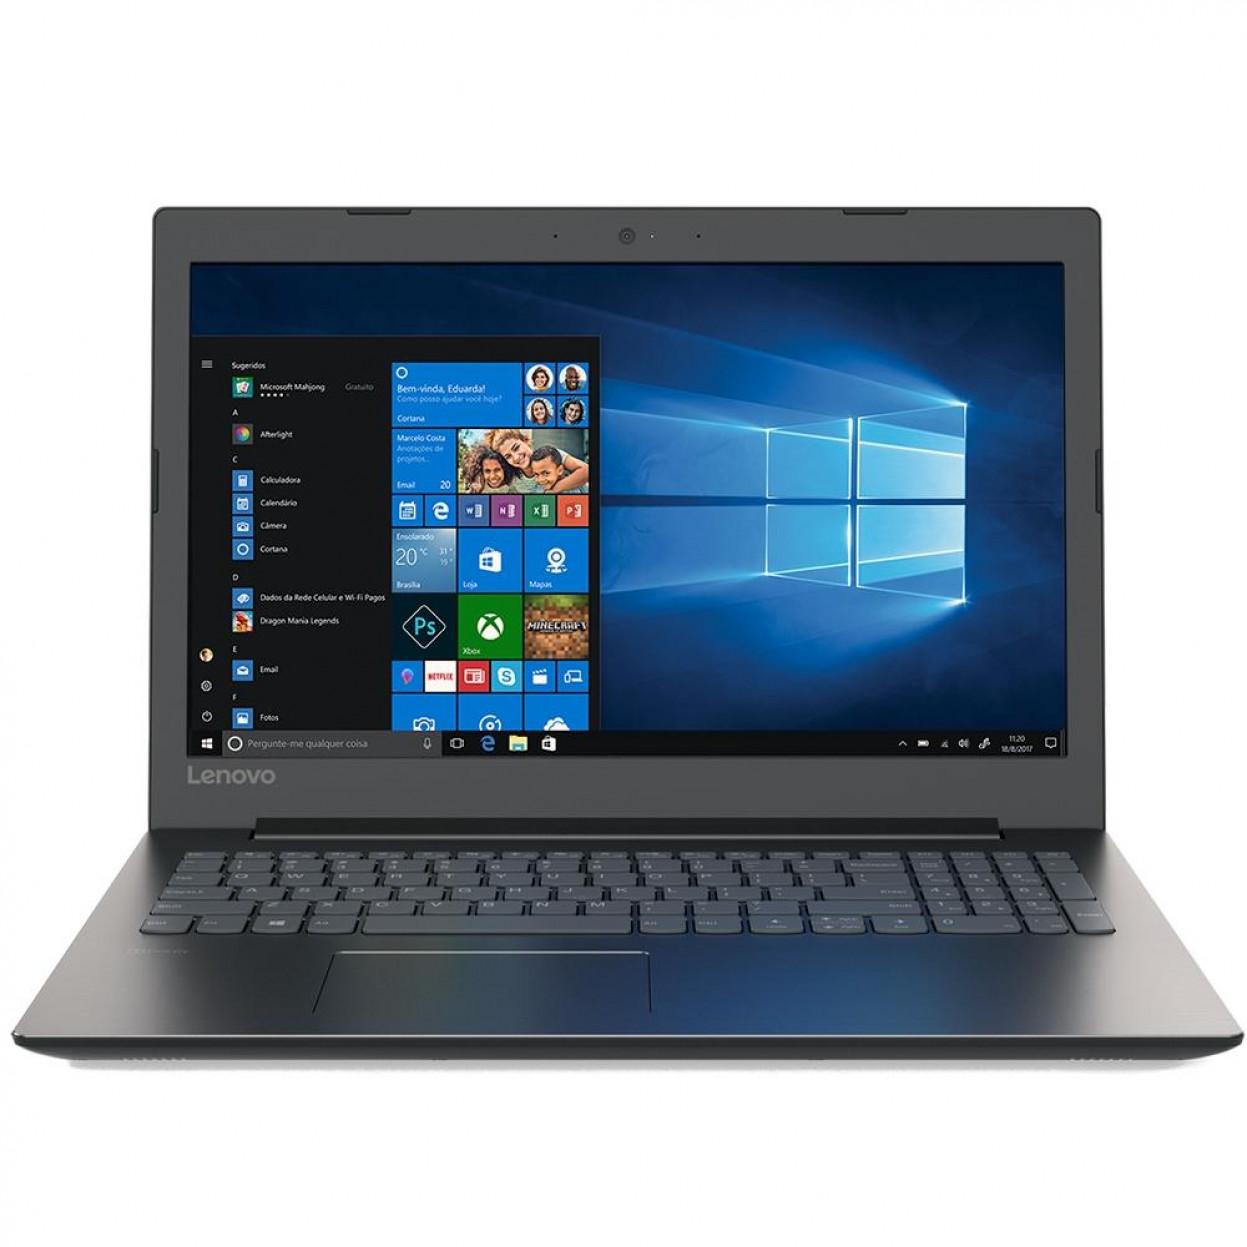 Notebook Lenovo B330 Core I5 8250u Memoria 4gb Ddr4 Ssd 120gb Tela 15.6' Fhd Windows 10 Home